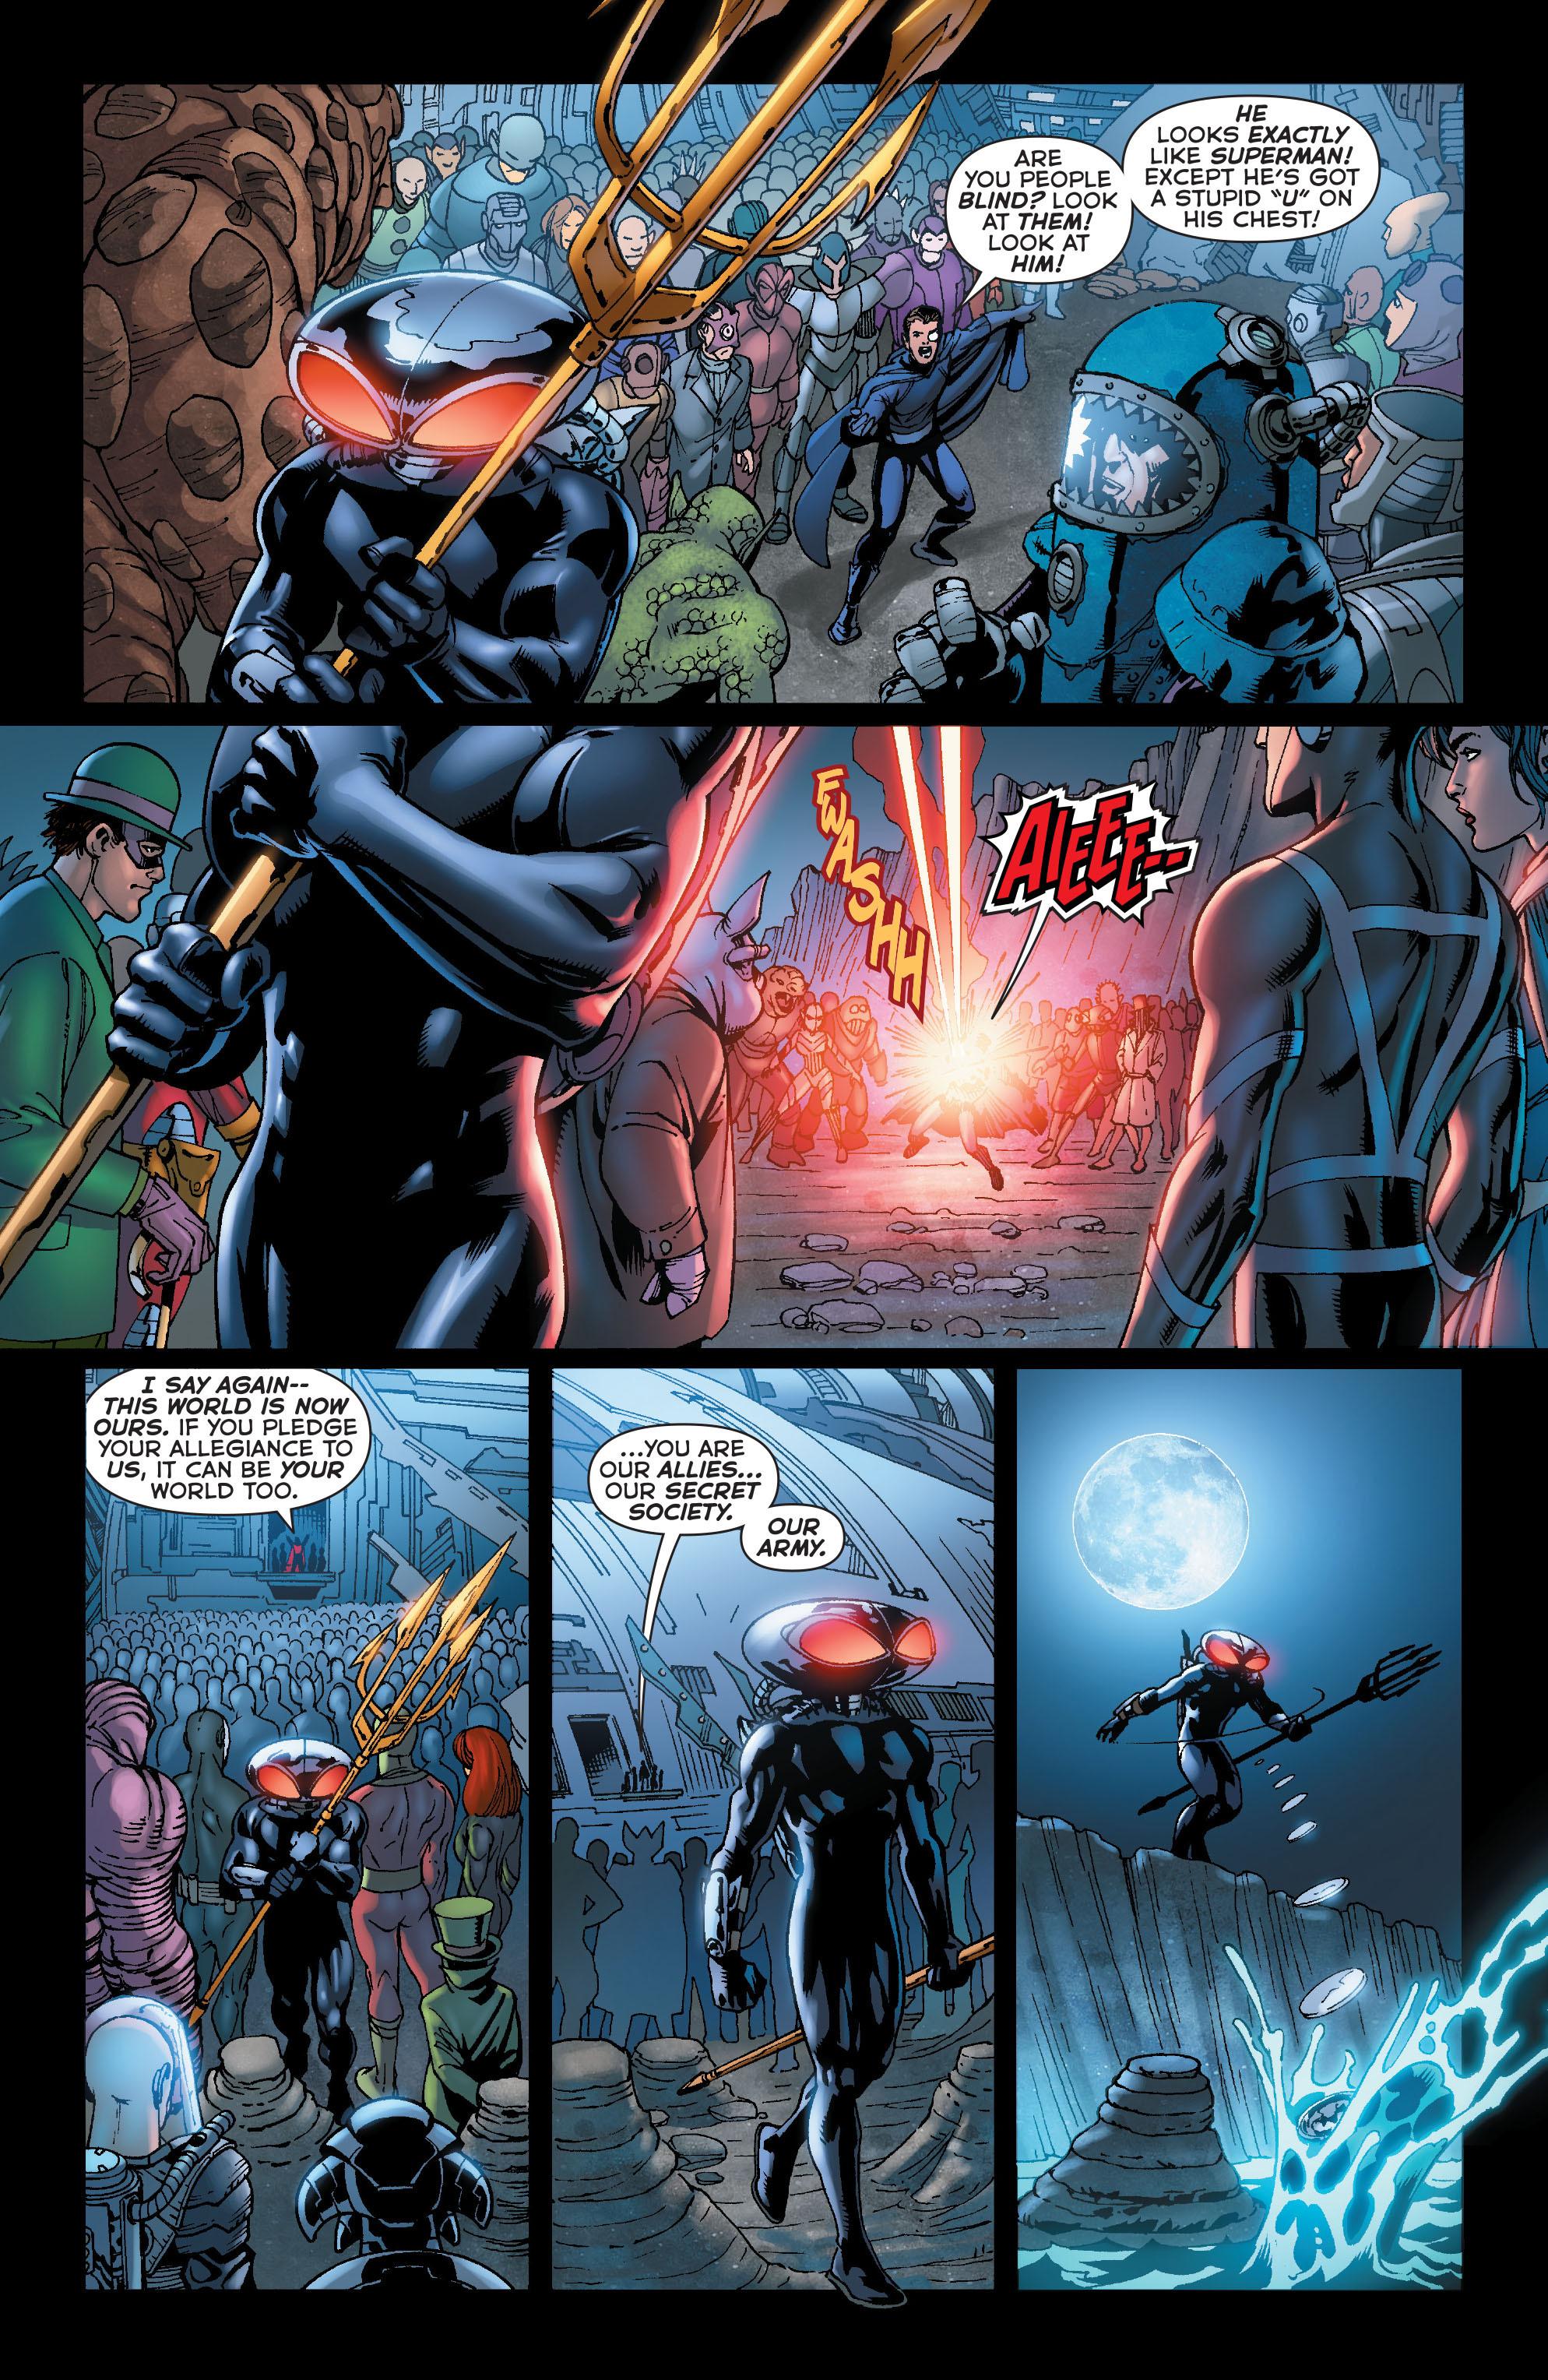 Read online Aquaman (2011) comic -  Issue #23.1 - 13